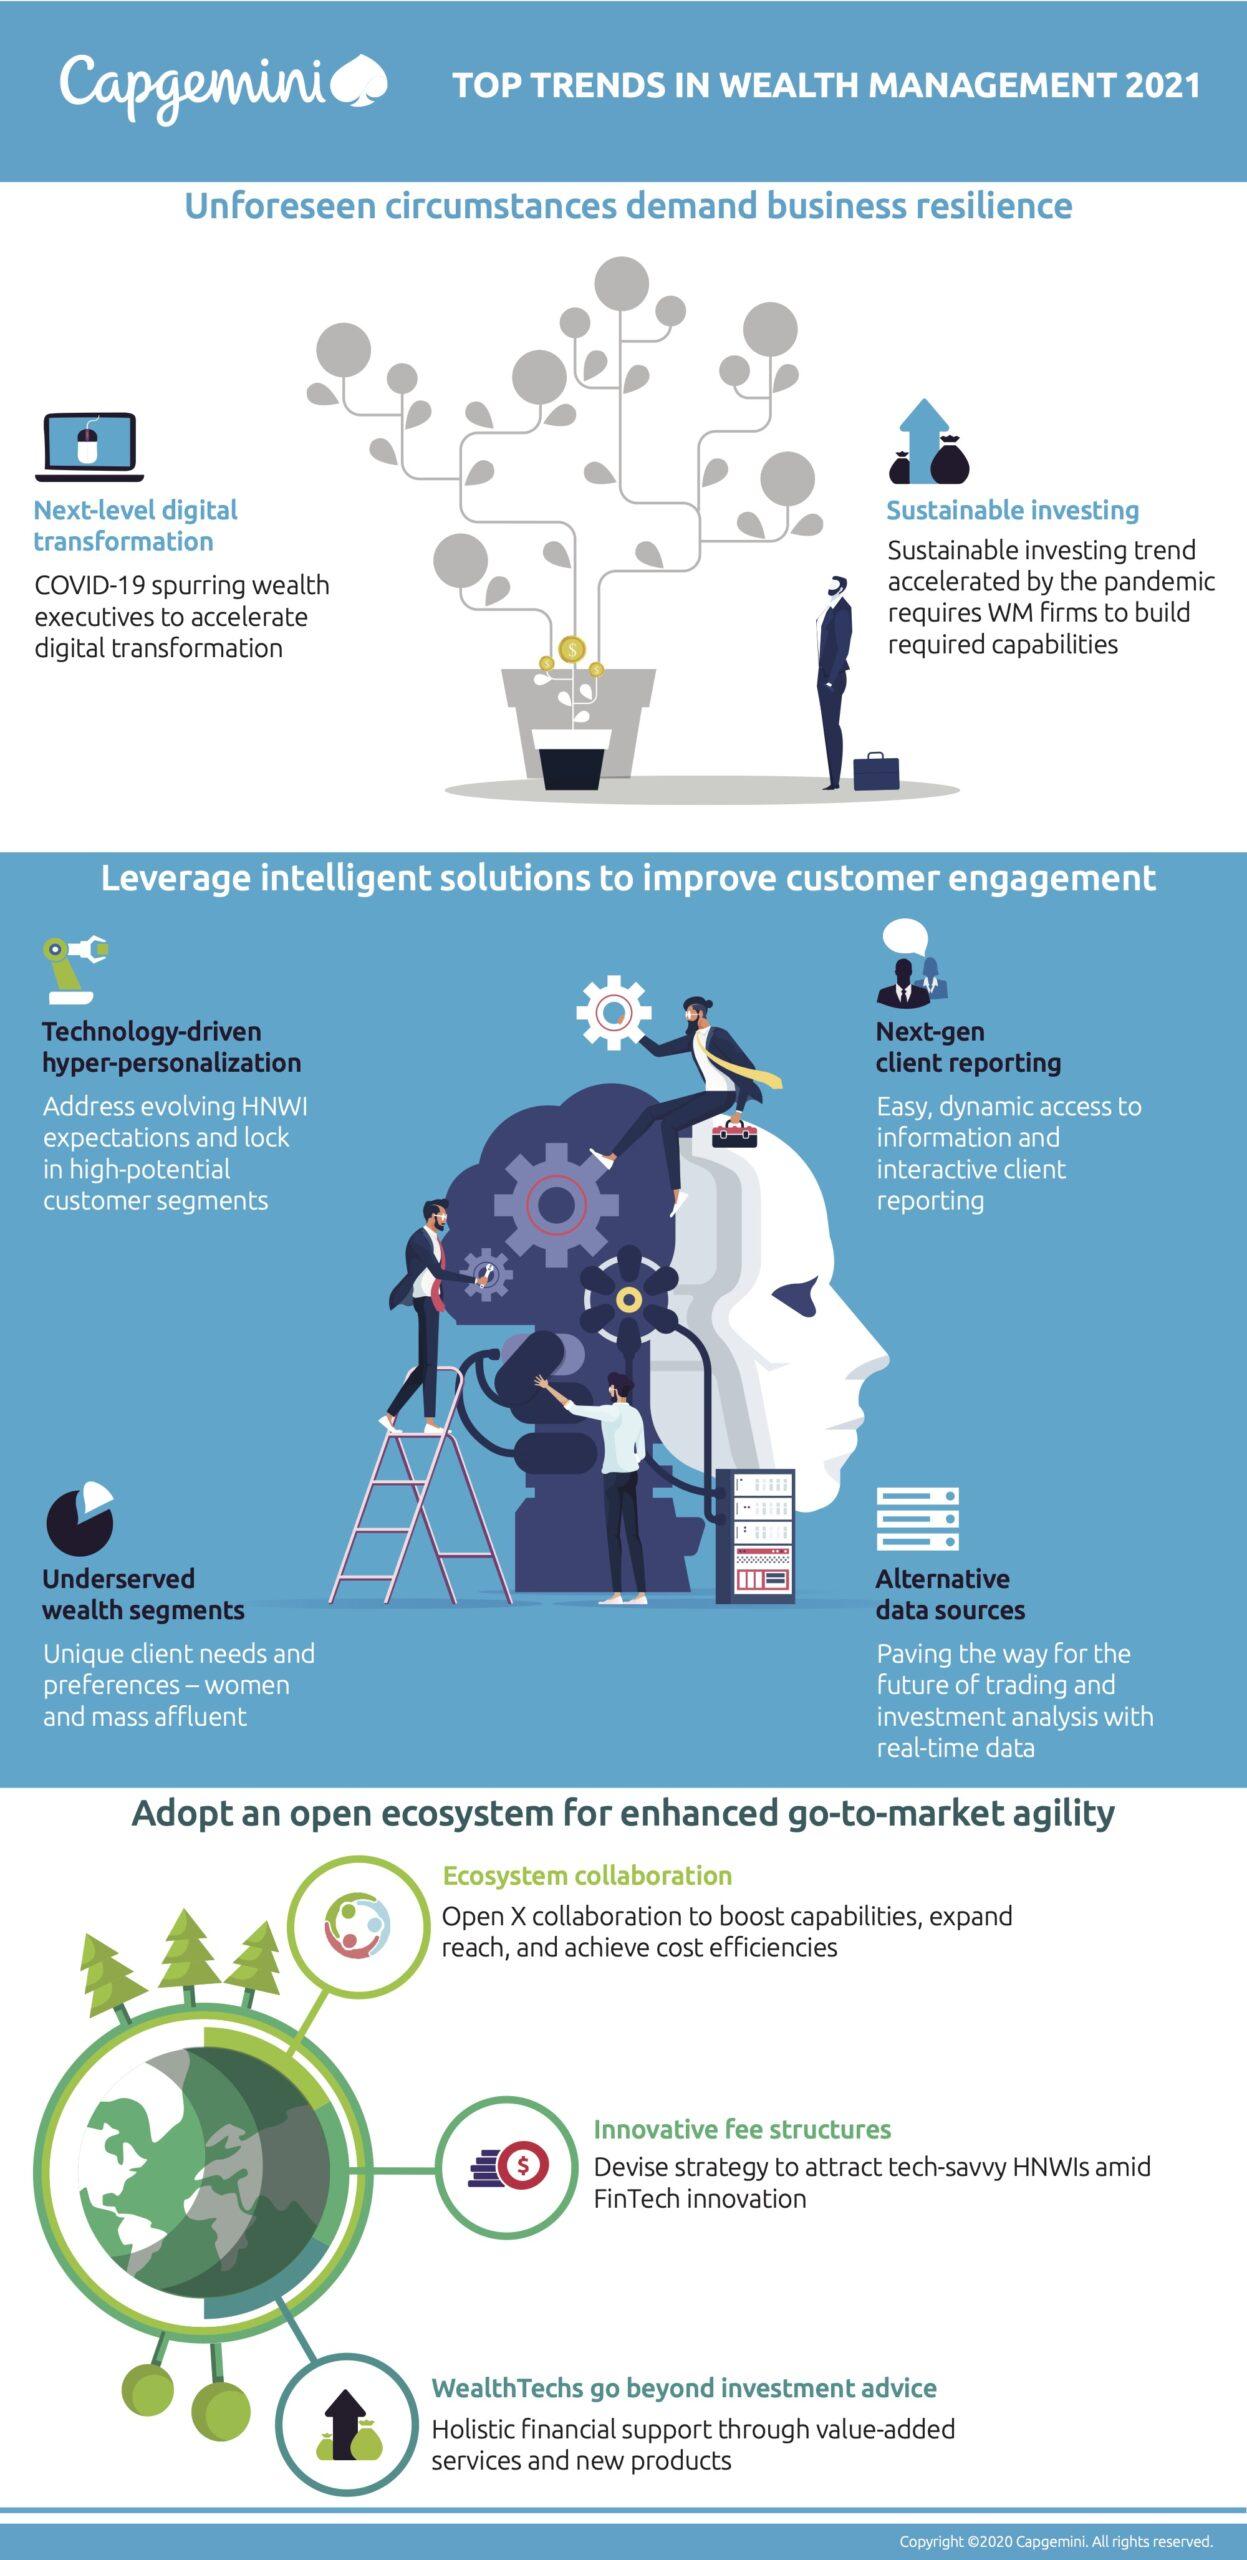 Top Trends 2021 in Wealth Management Infographic, Capgemini, Nov 2020